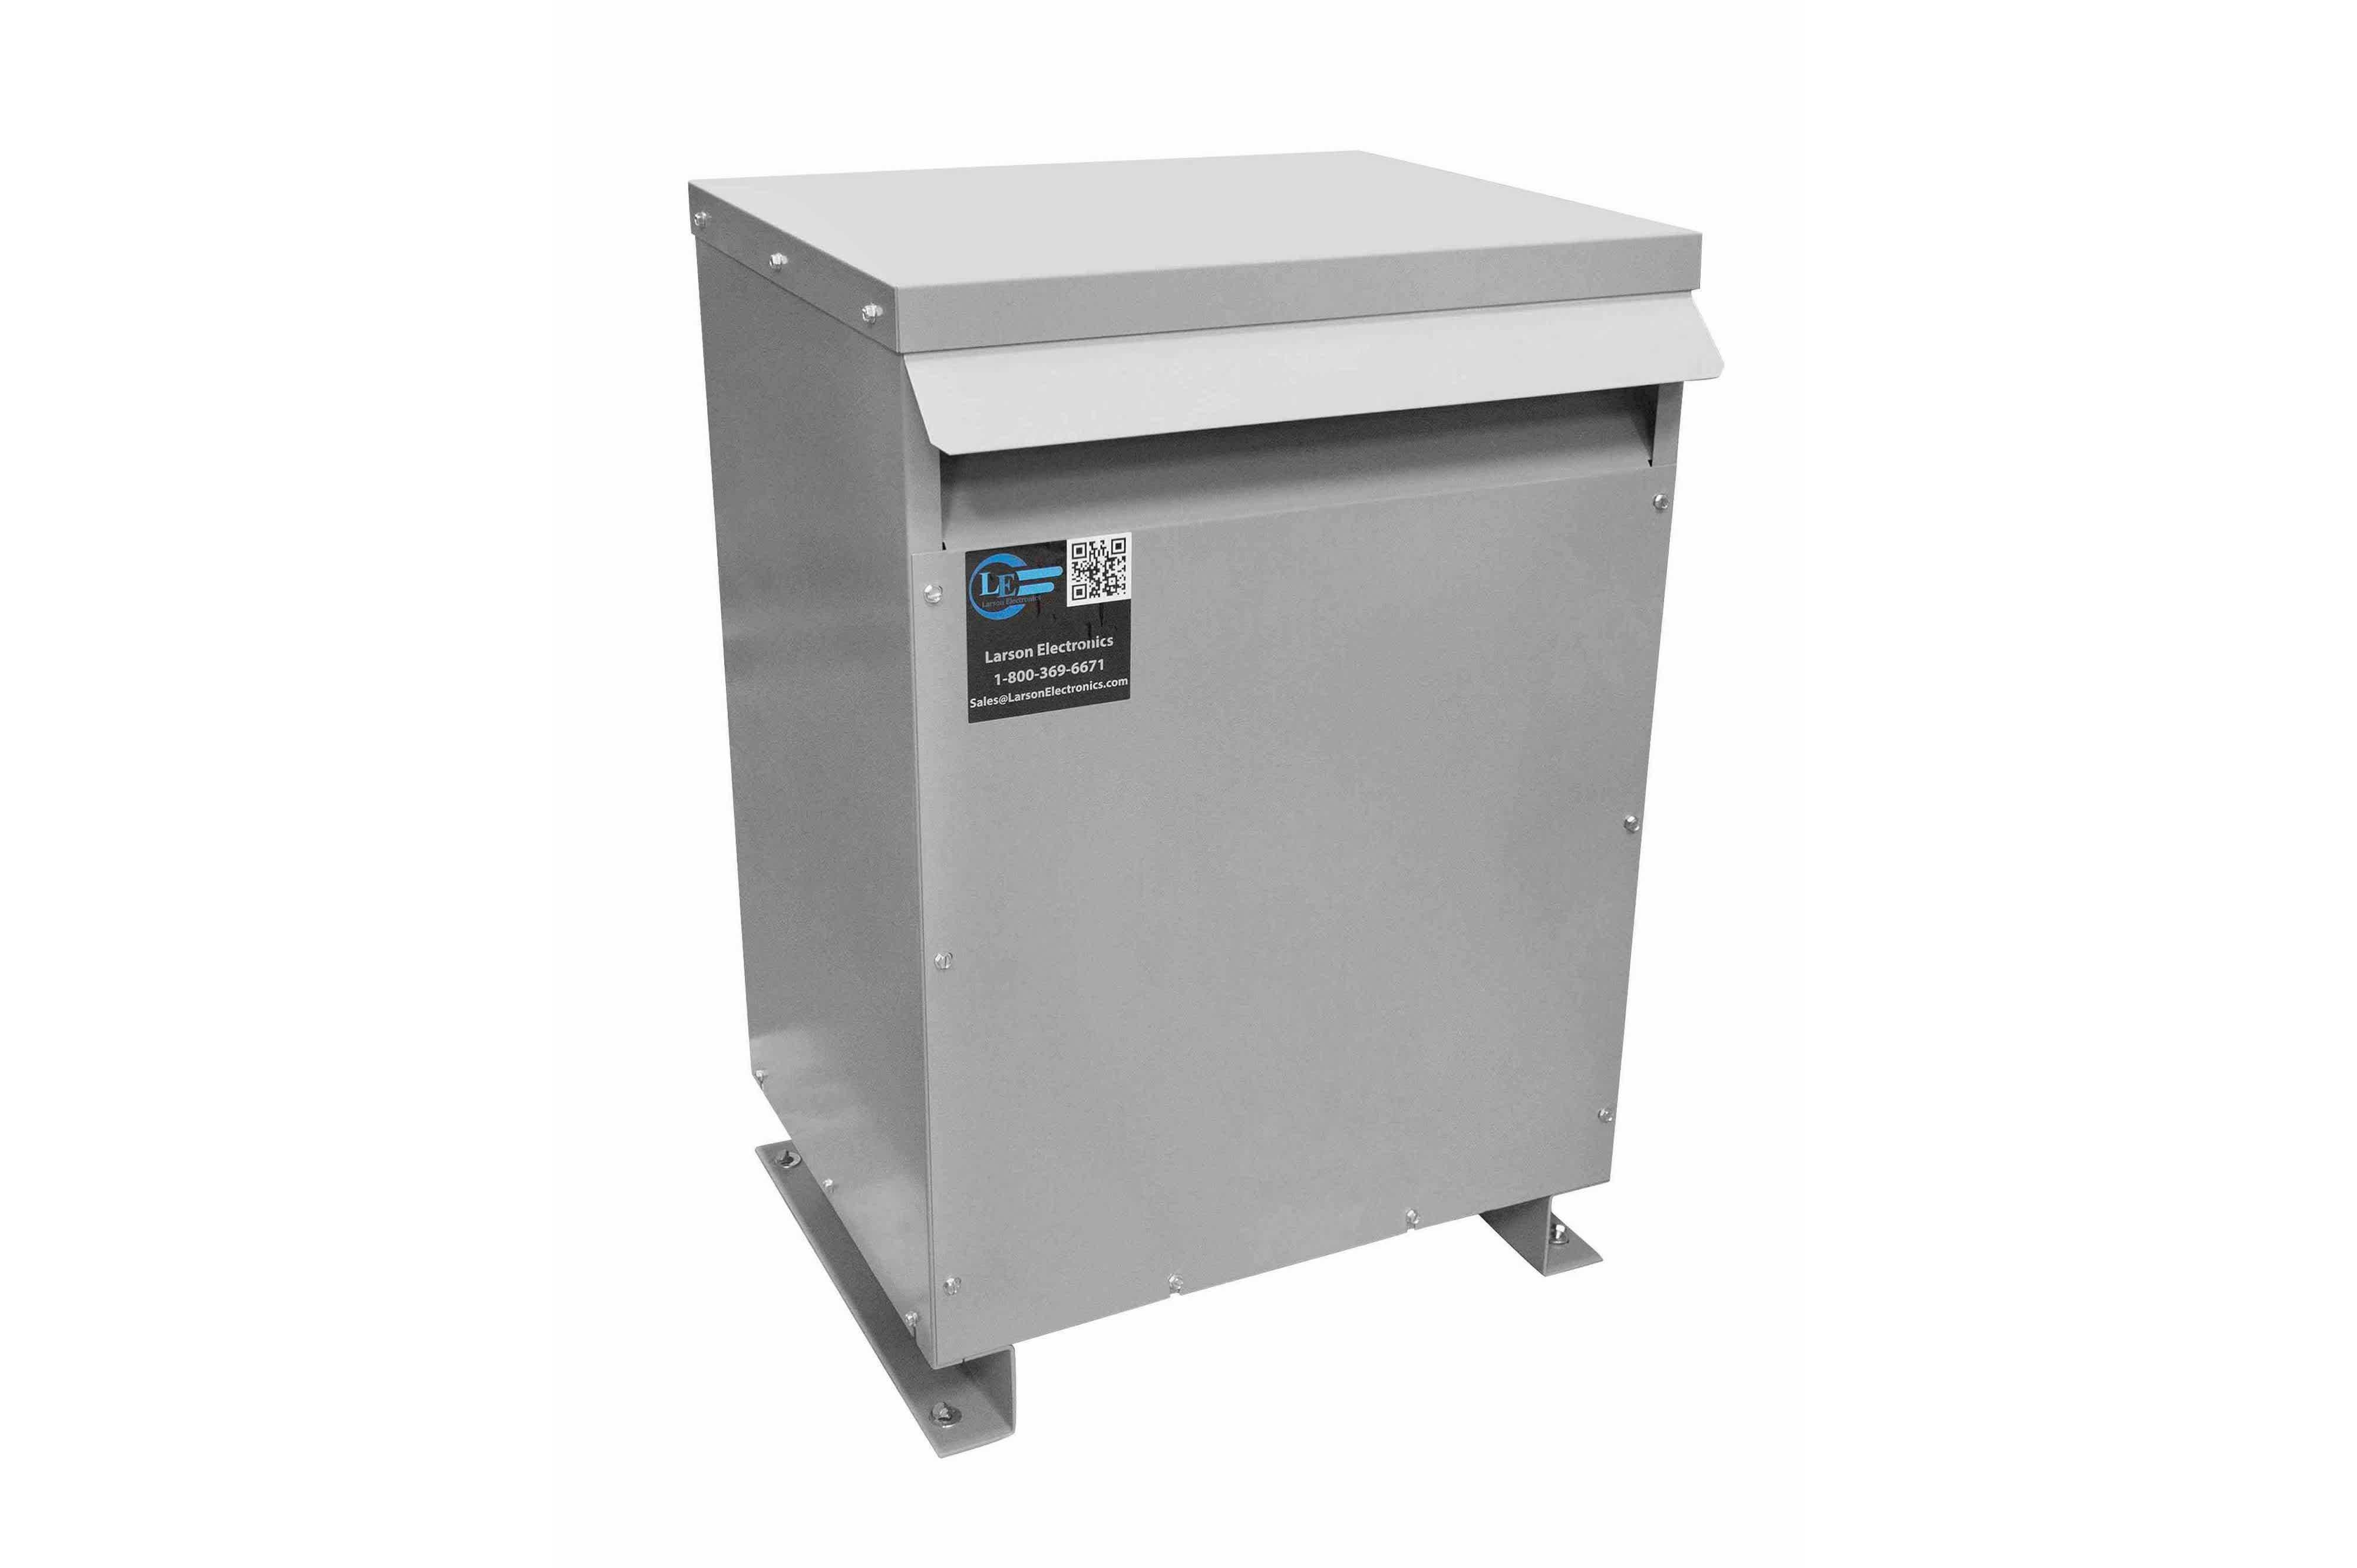 150 kVA 3PH Isolation Transformer, 480V Wye Primary, 575V Delta Secondary, N3R, Ventilated, 60 Hz